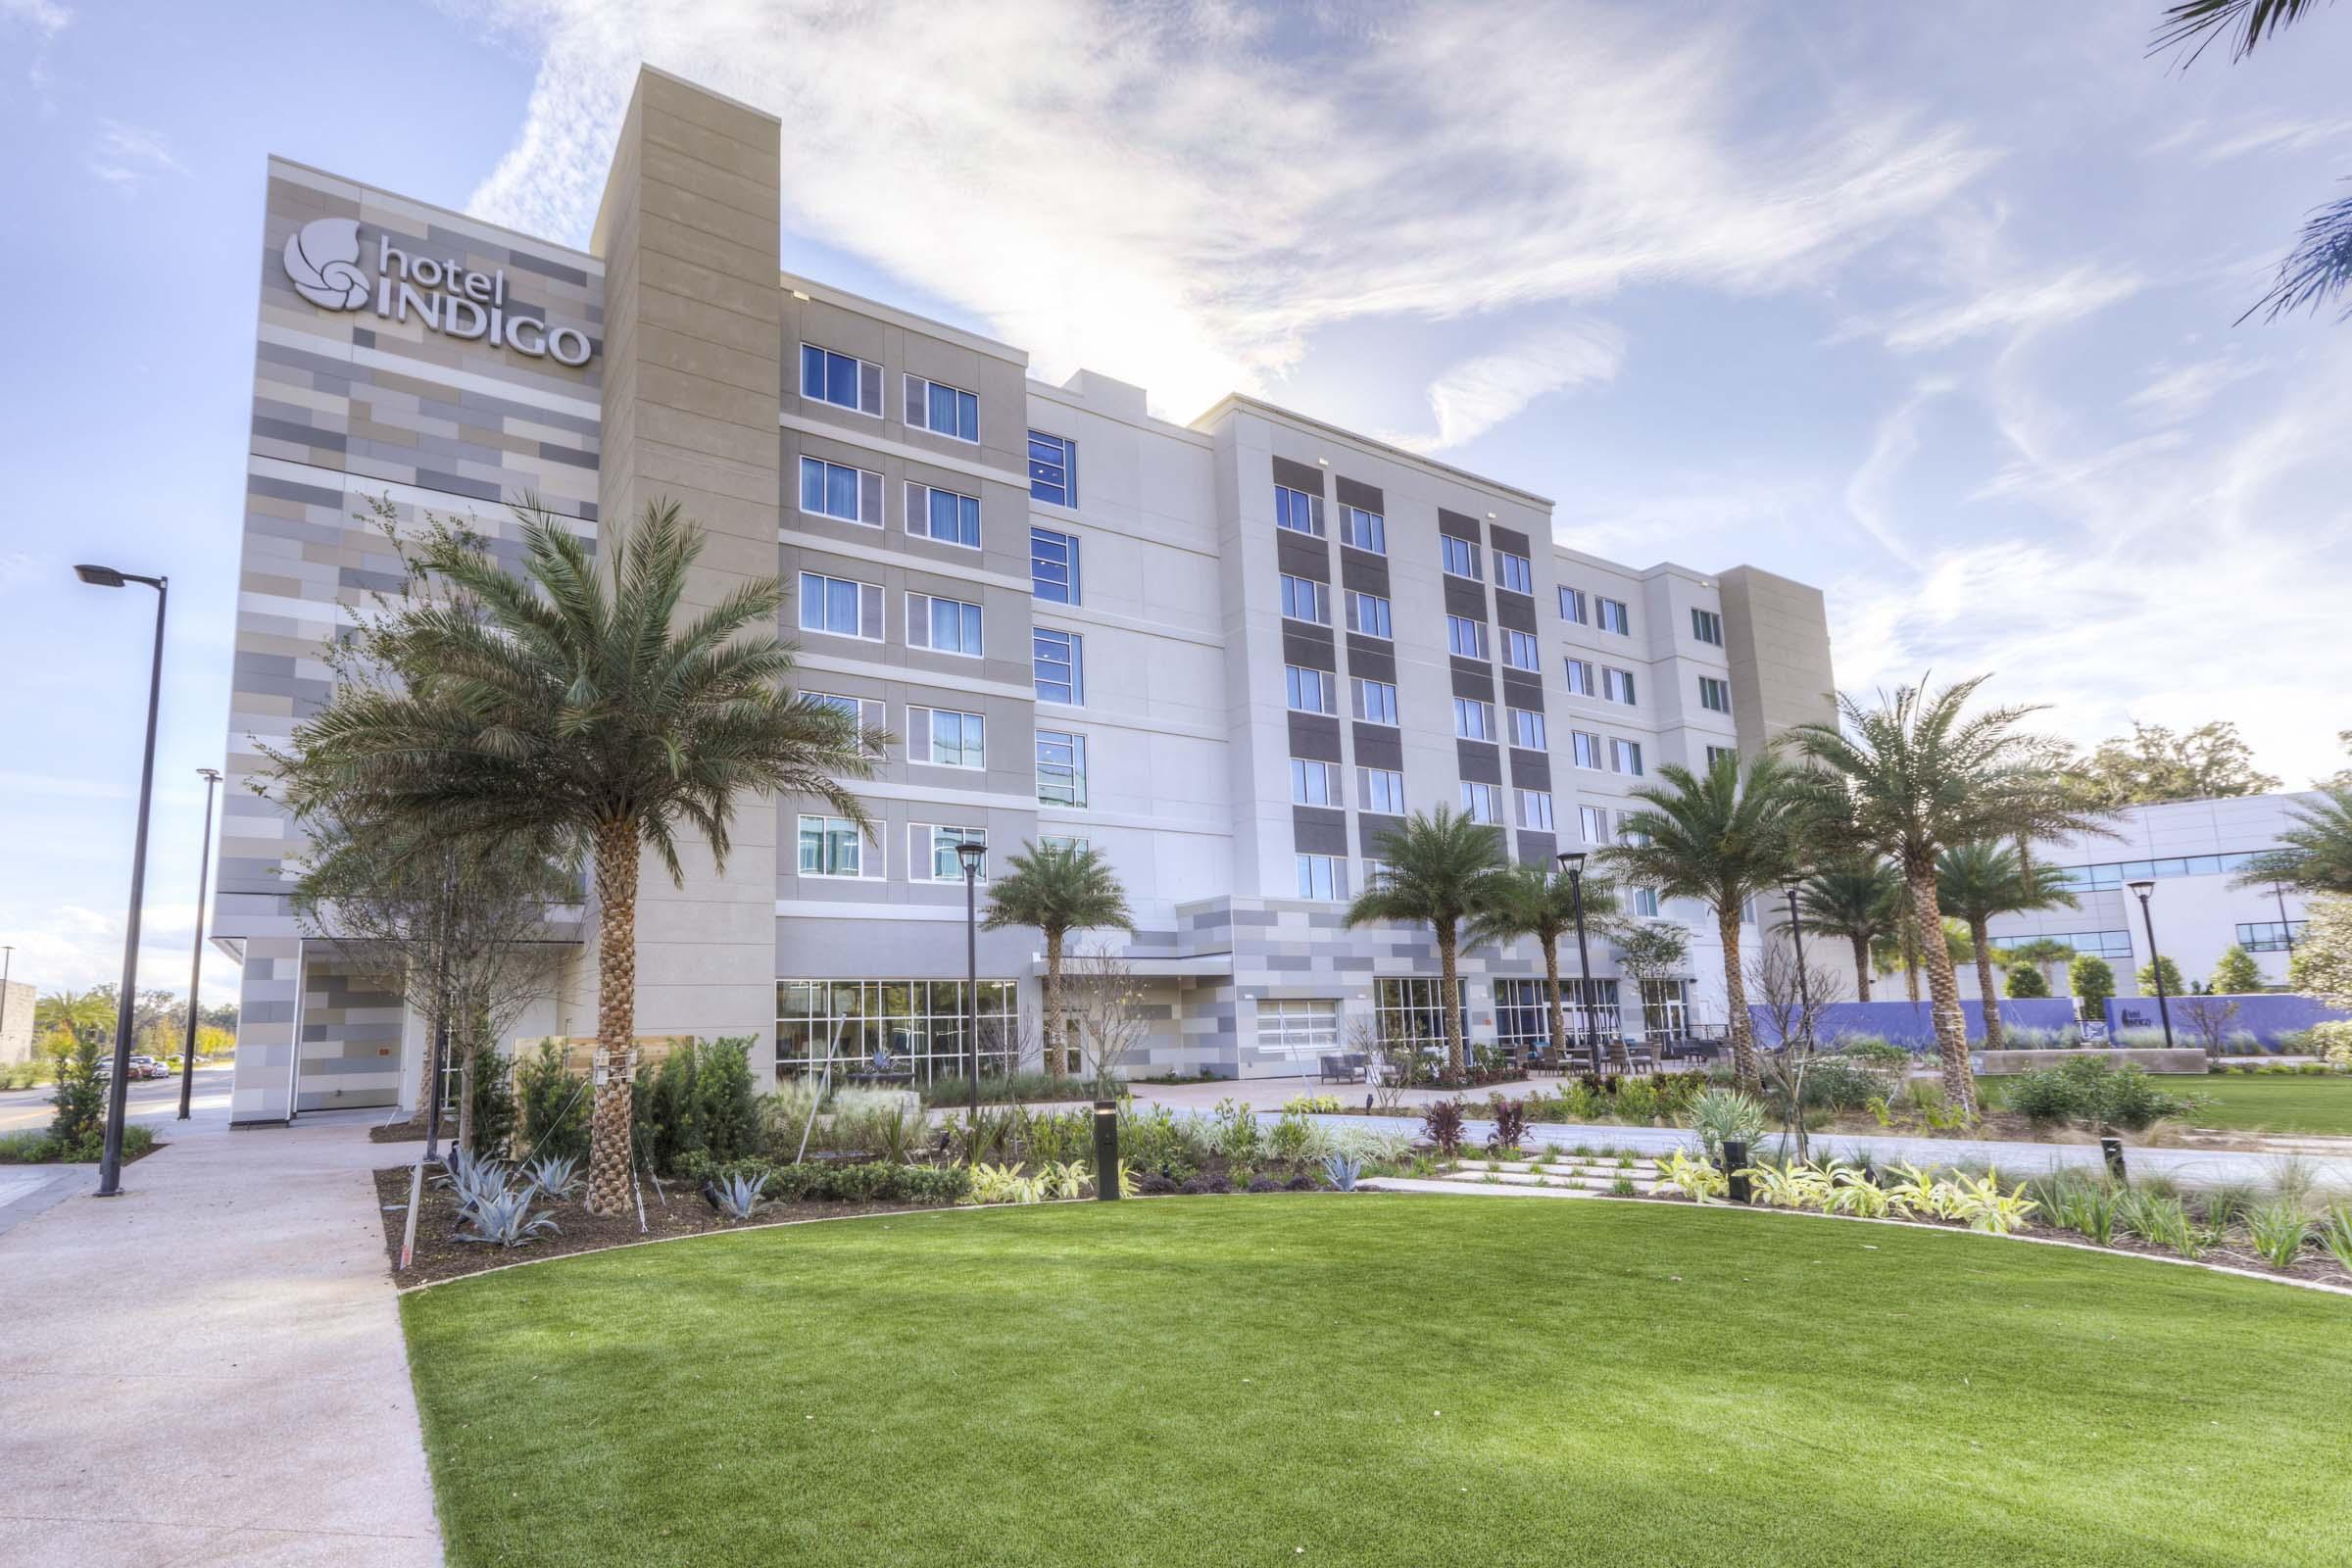 Hotel Indigo_main